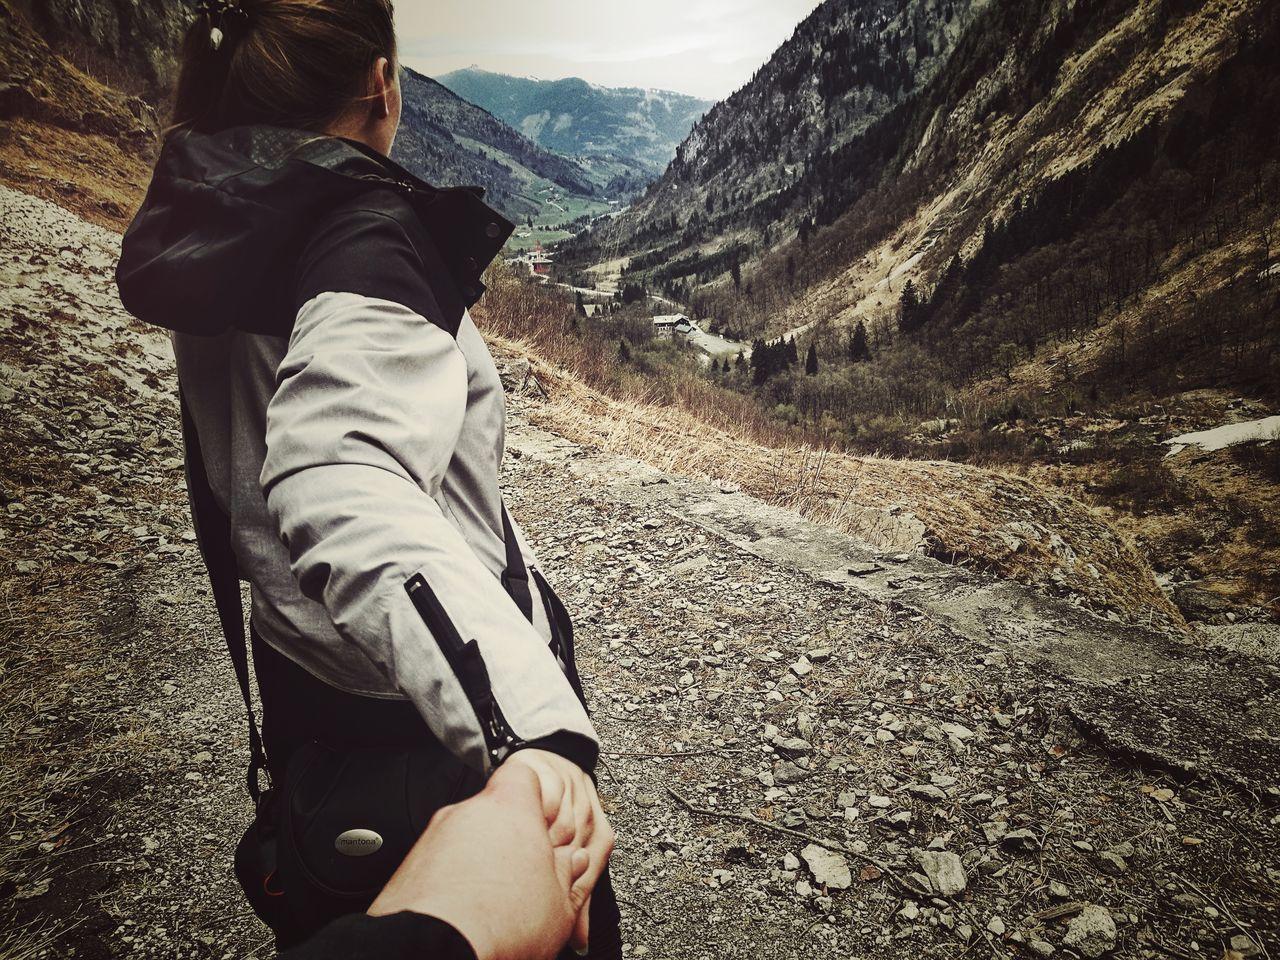 Long Goodbye Girlfriend StillLifePhotography Outdoors No People Natural Light WoodLand Nature Mountain Adventure Horizont  Beginning Hiking